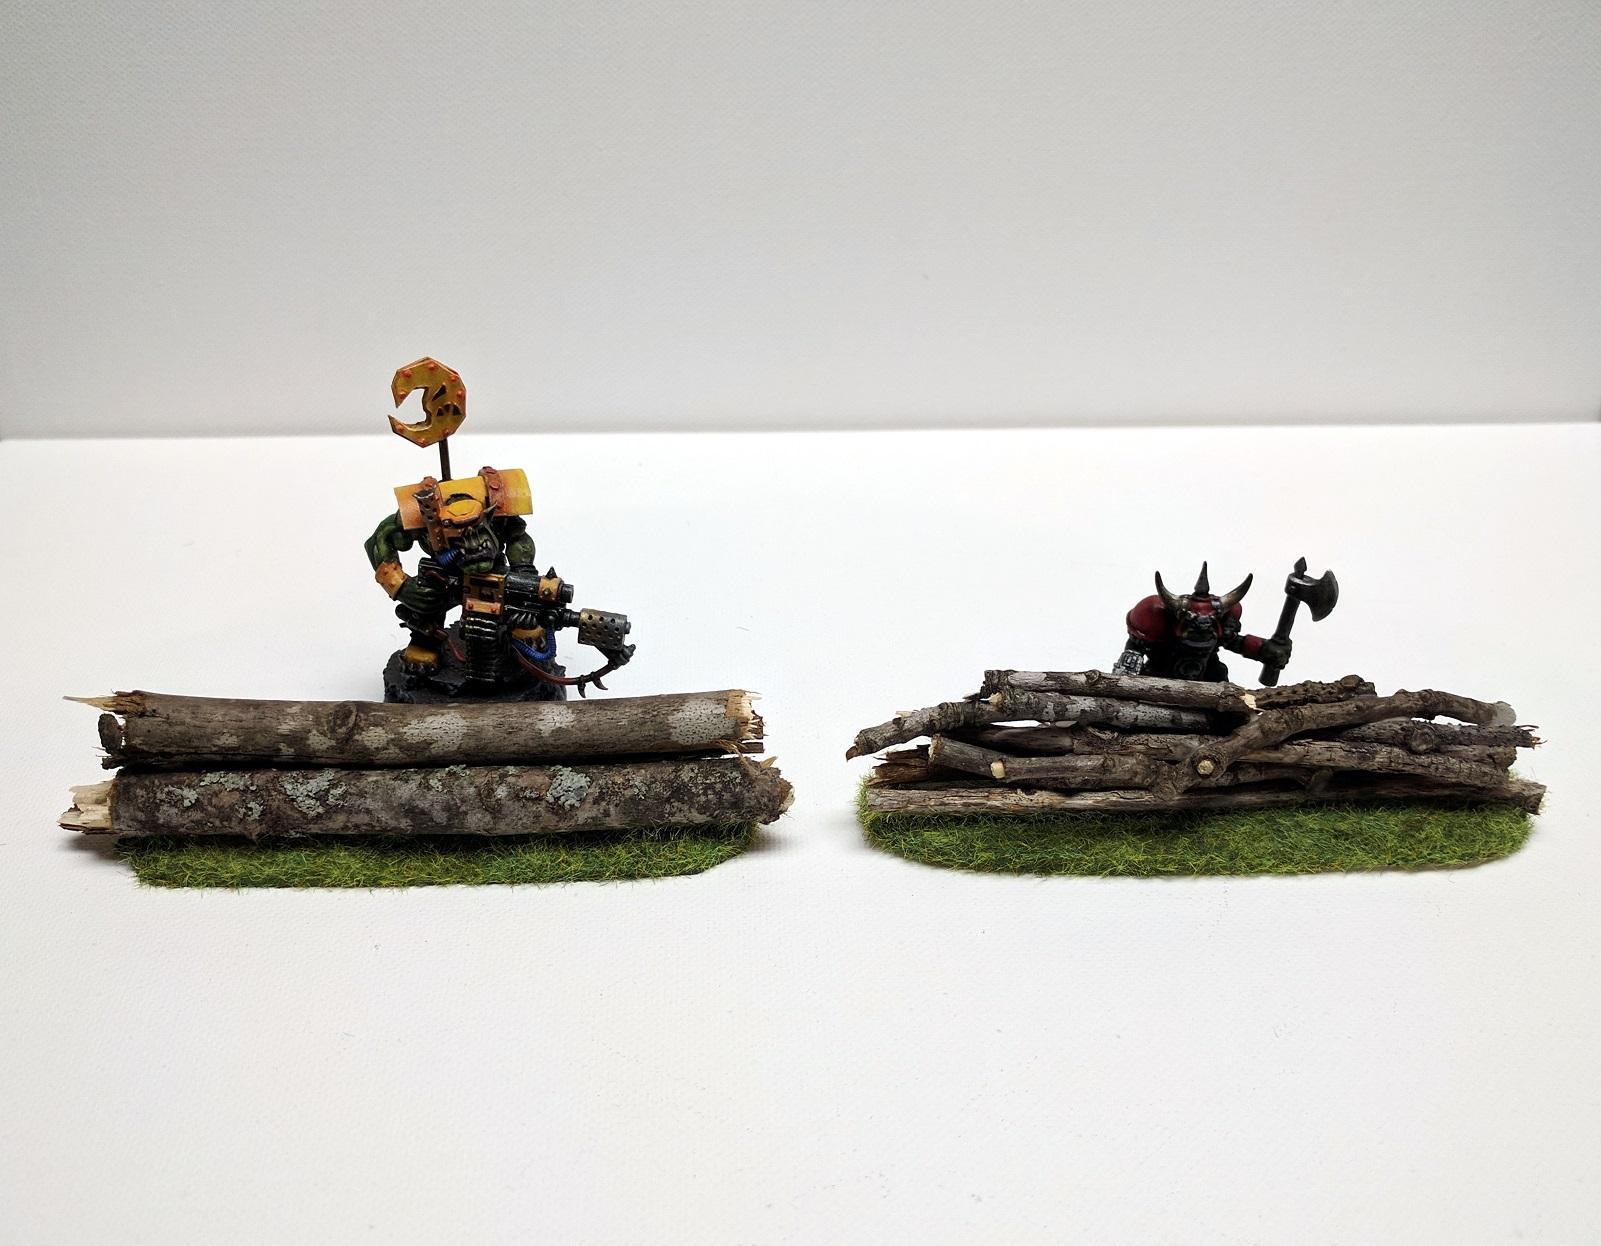 Barricade, Custom, Logs, Orks, Scratch Build, Terrain